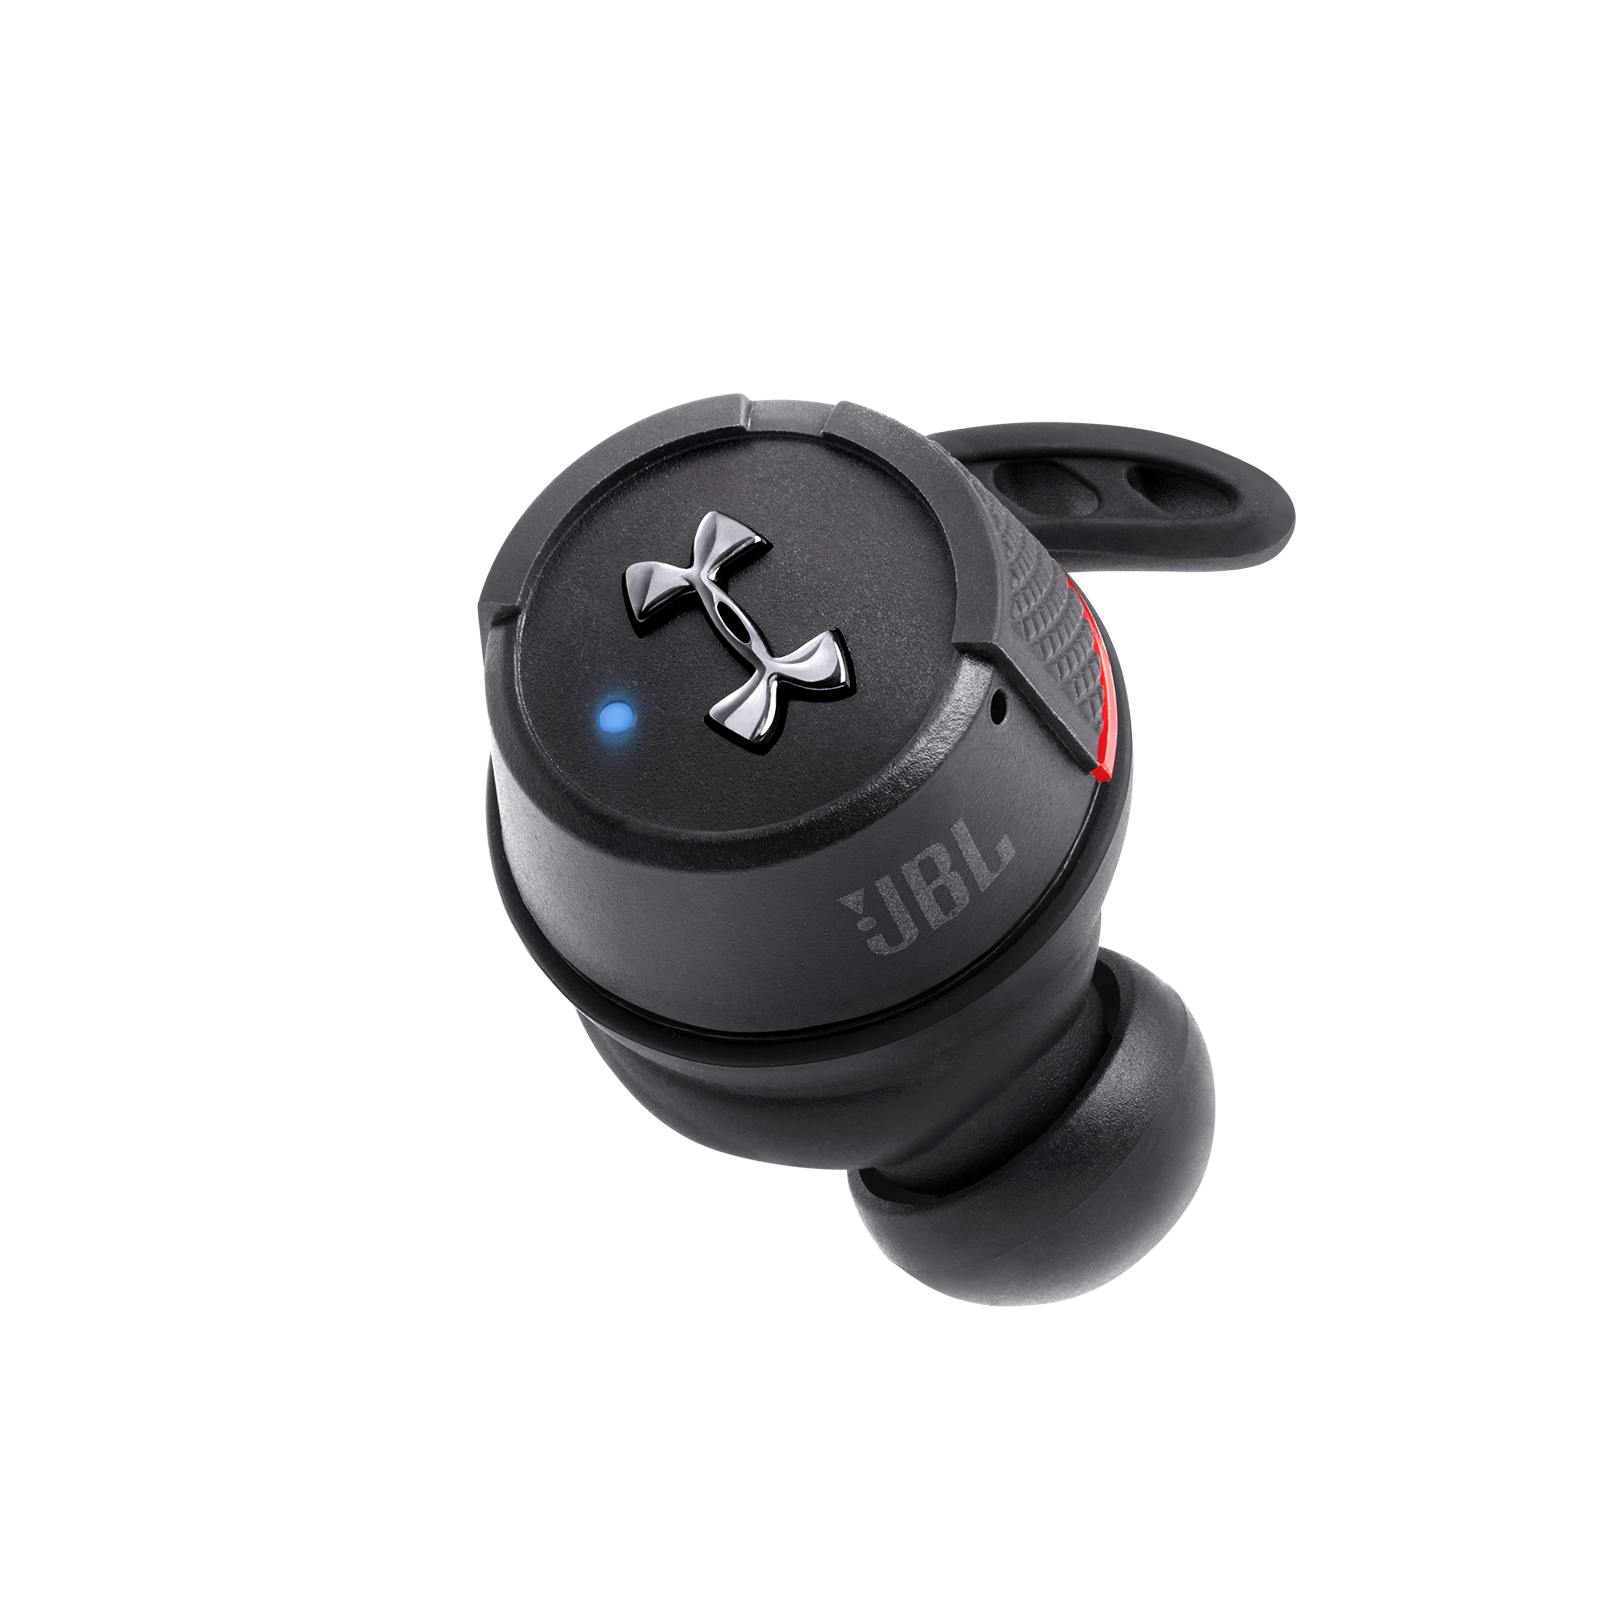 JBL FLASH EAR PIECE (RIGHT) - Black - Hero